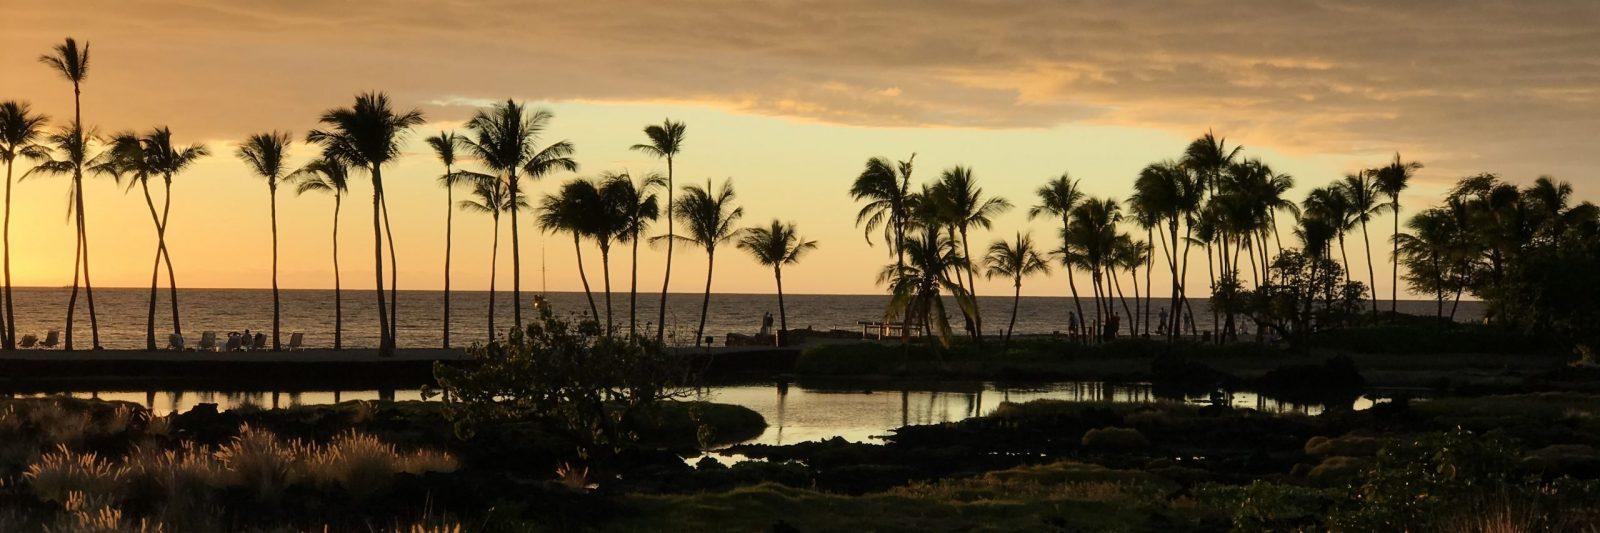 Sunset on Big Island